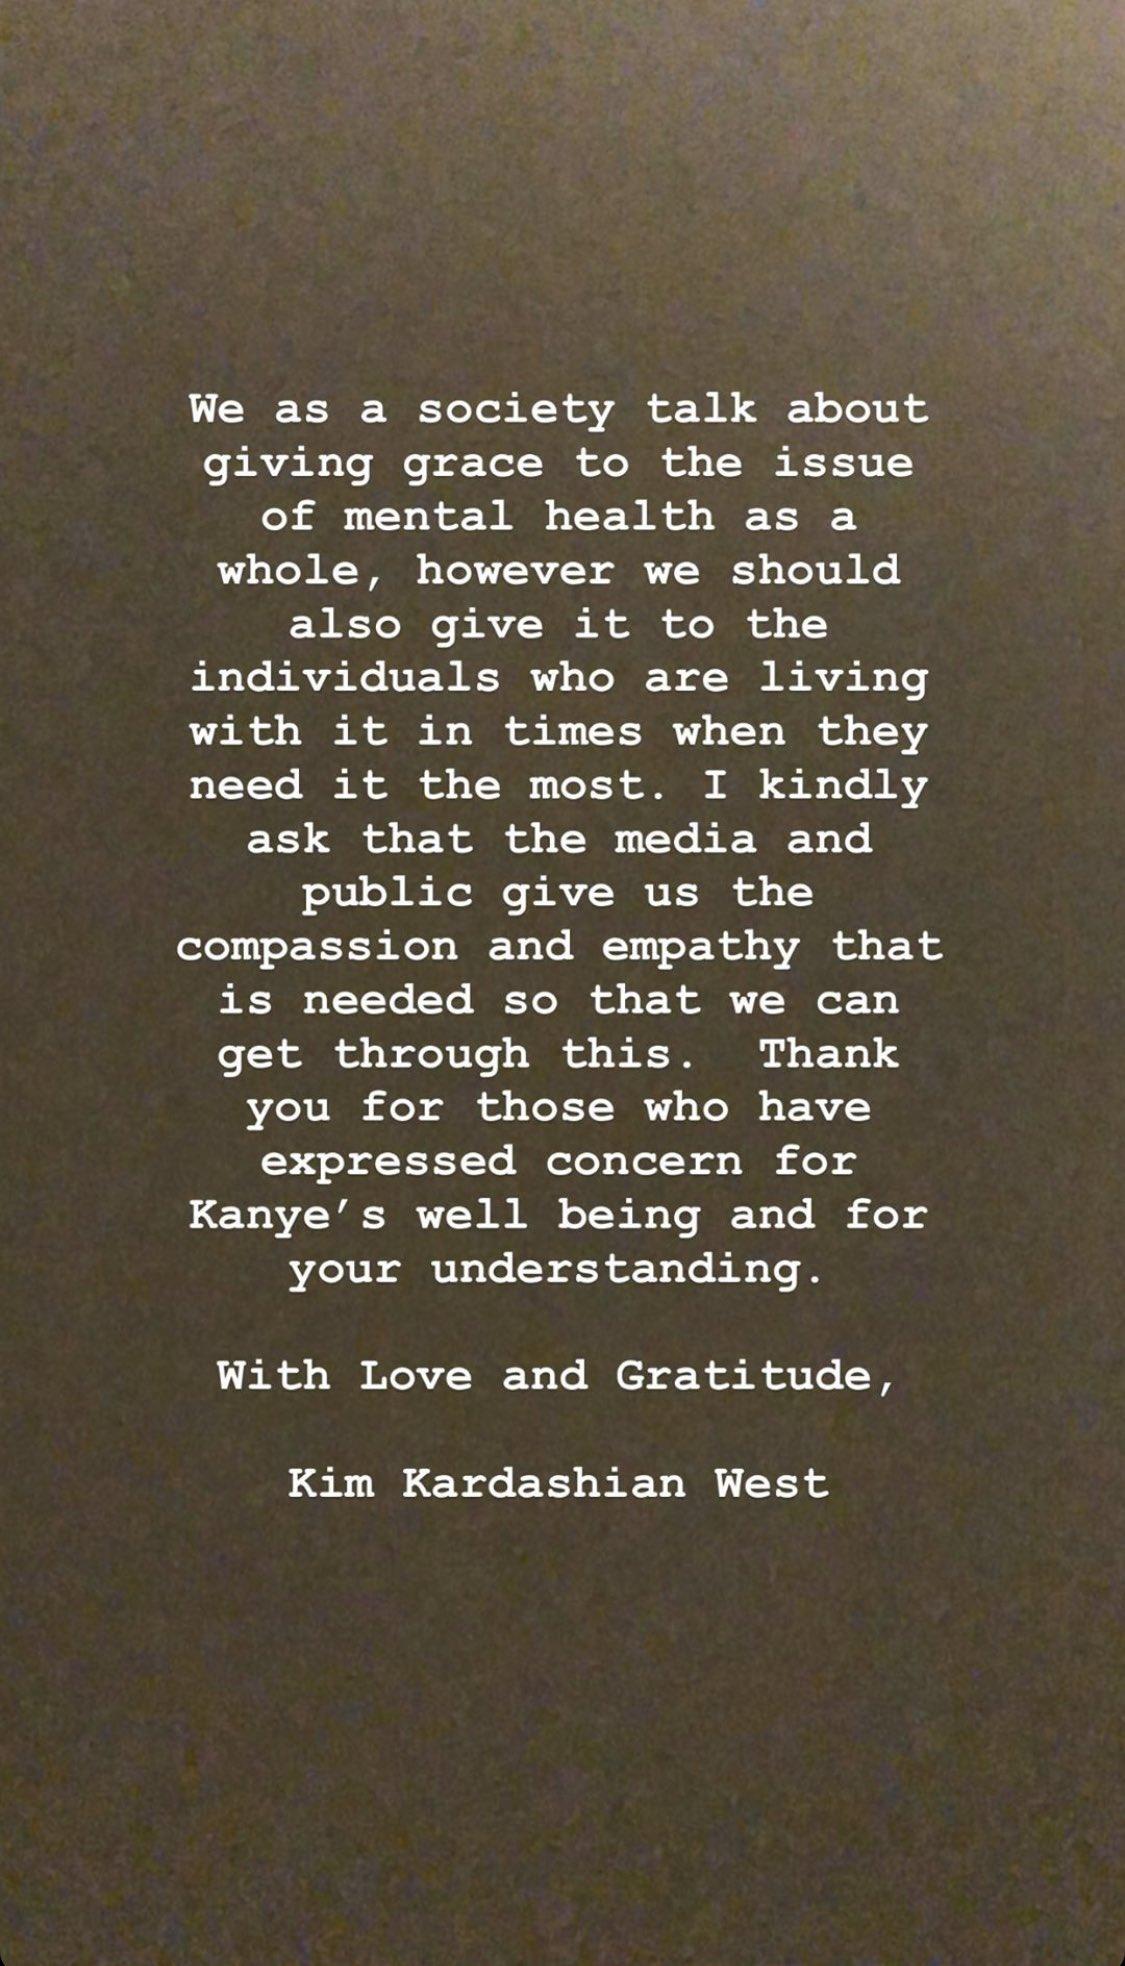 Kim Kardashian Instagram Story